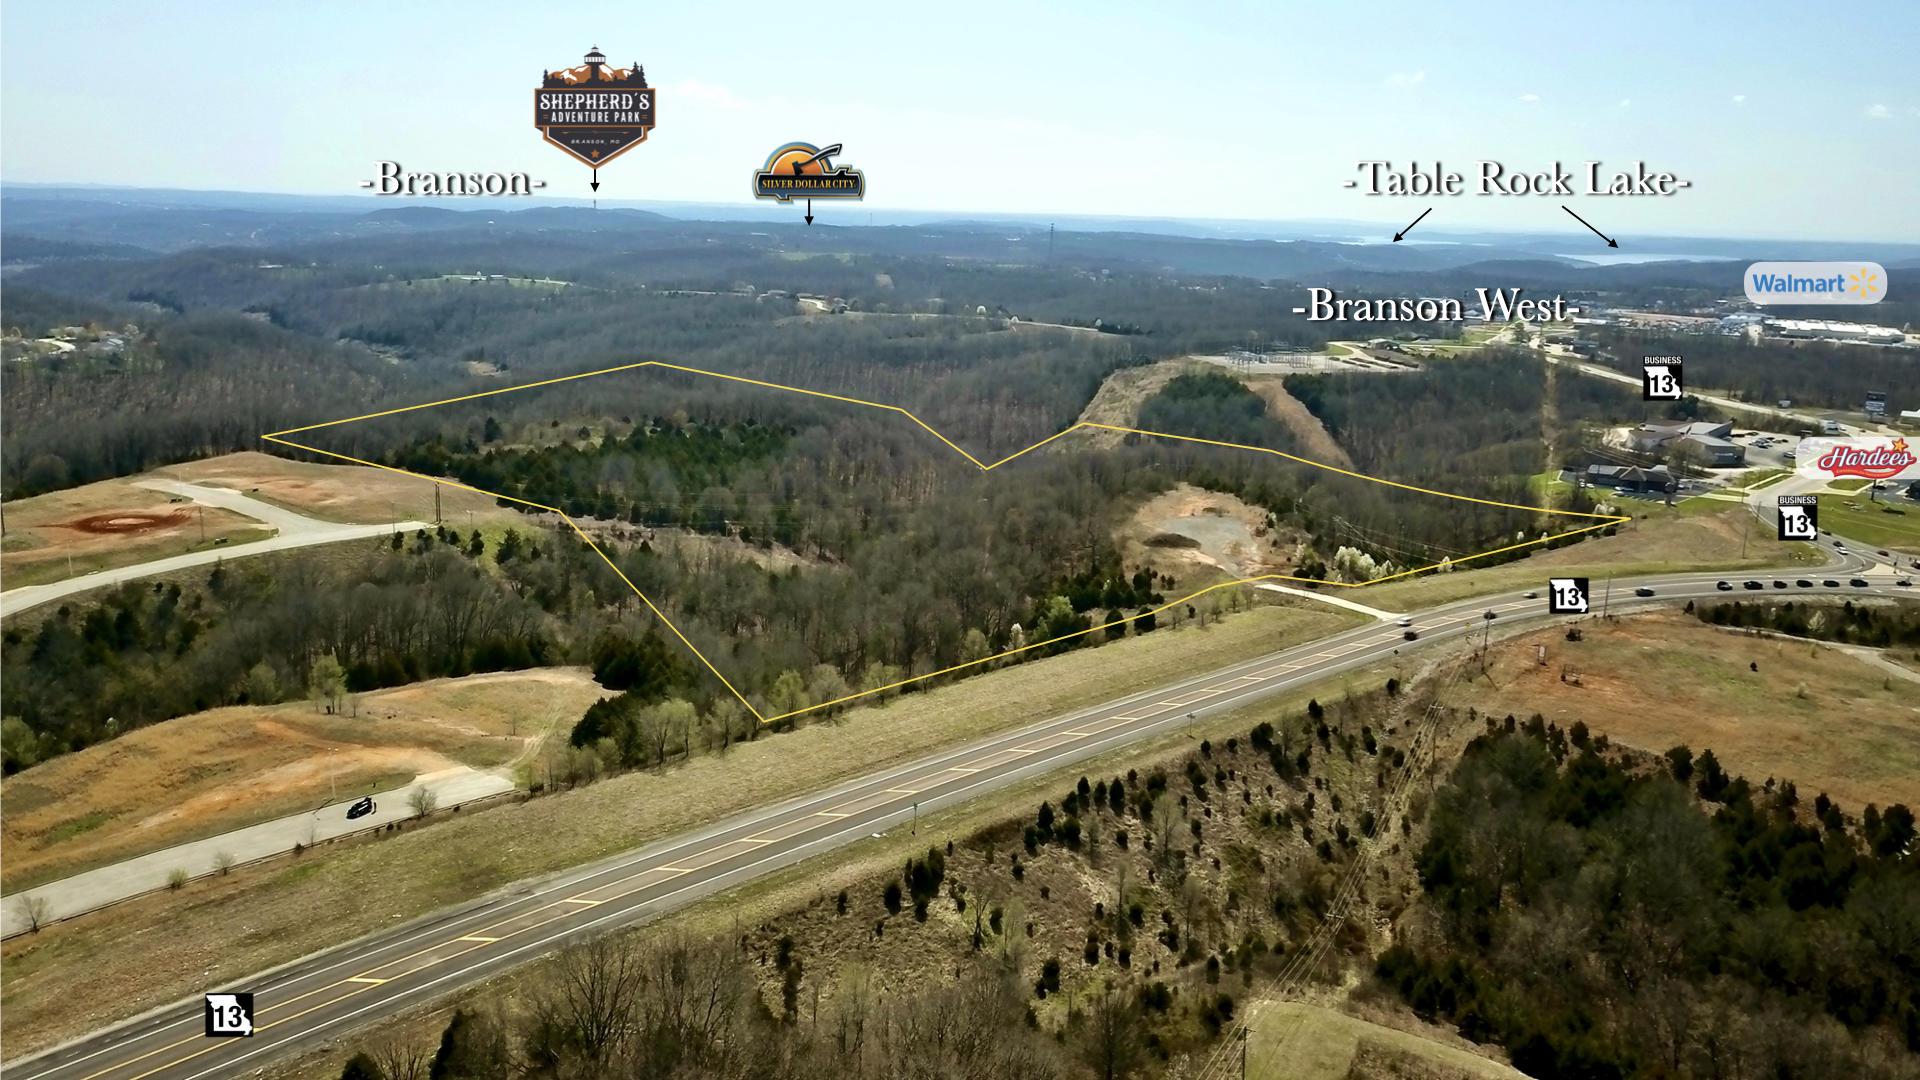 000 Missouri Branson West, MO 65737